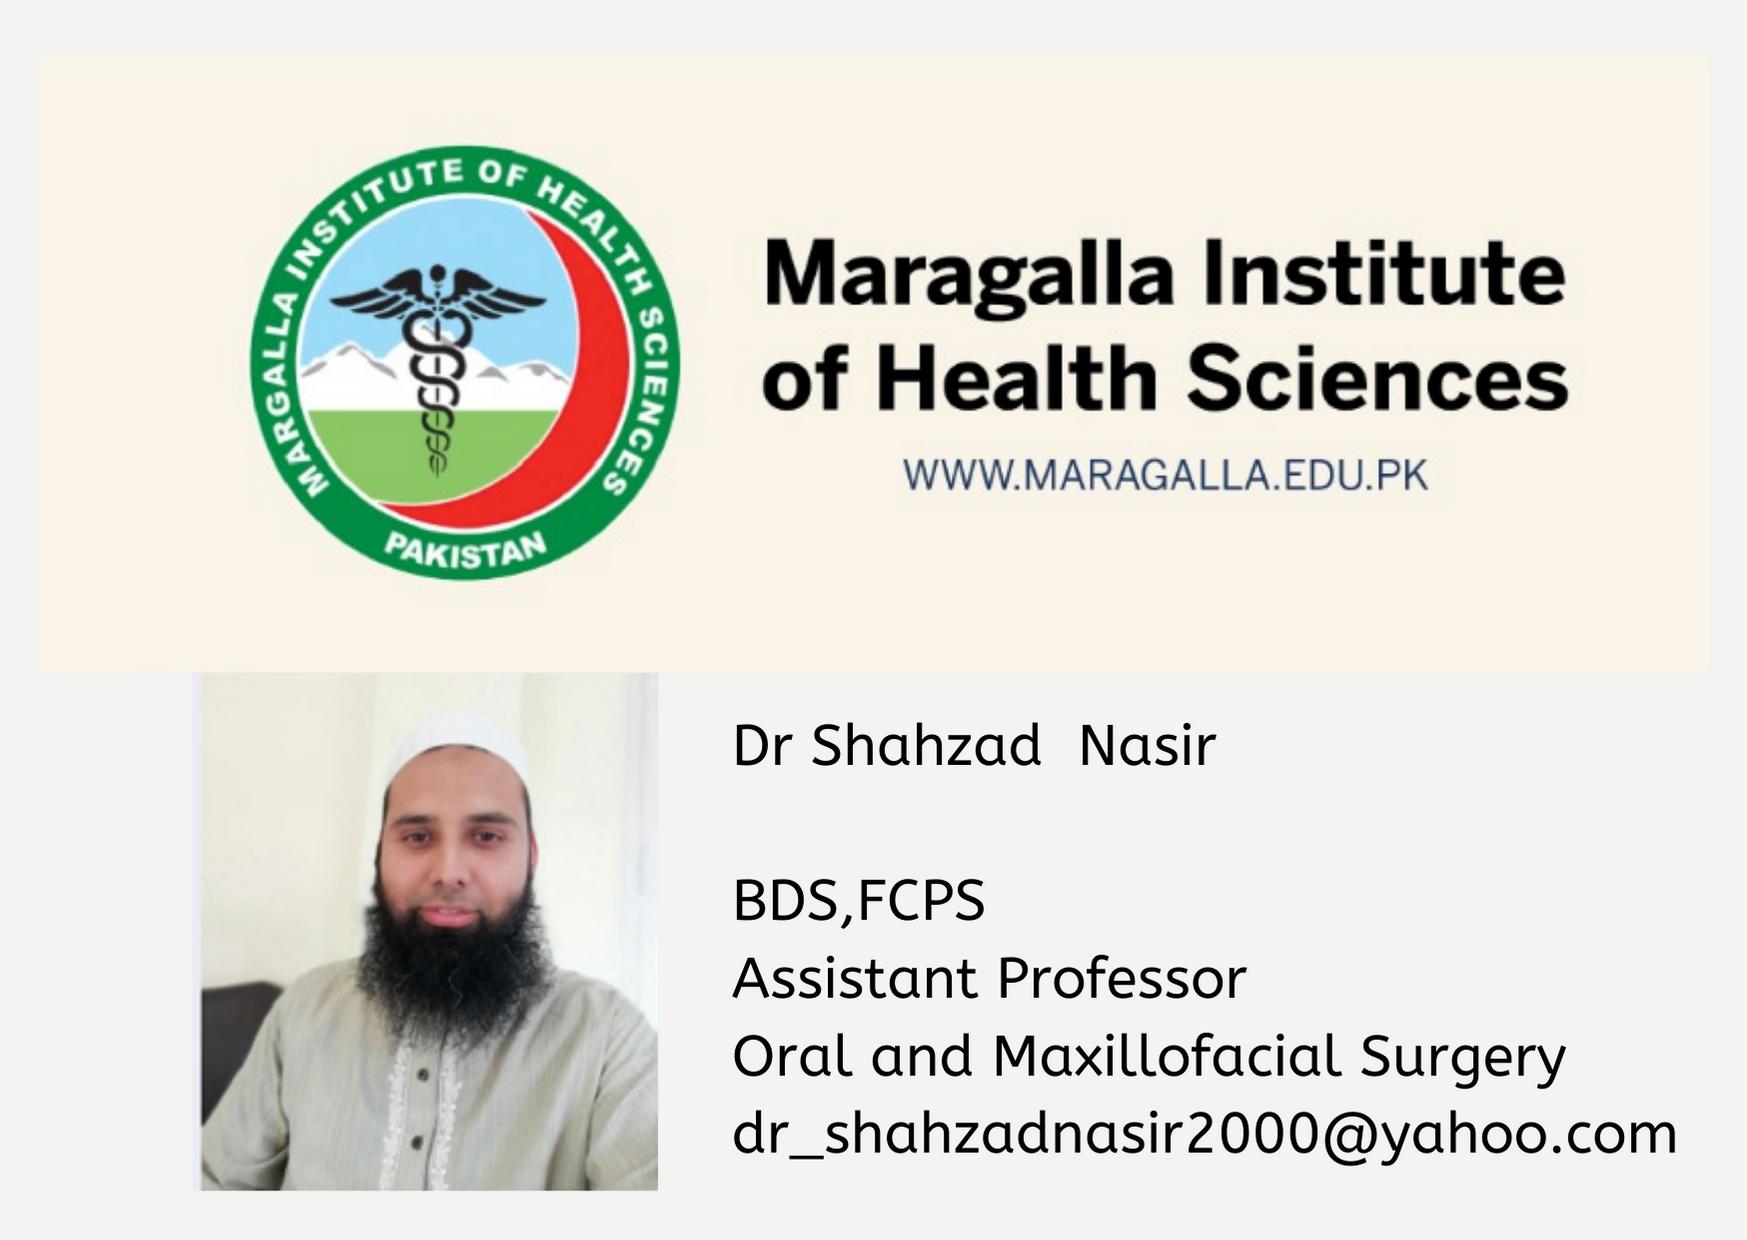 MIHS RAWALPINDI by  Dr Shahzad nasirAssistant professor OMFS